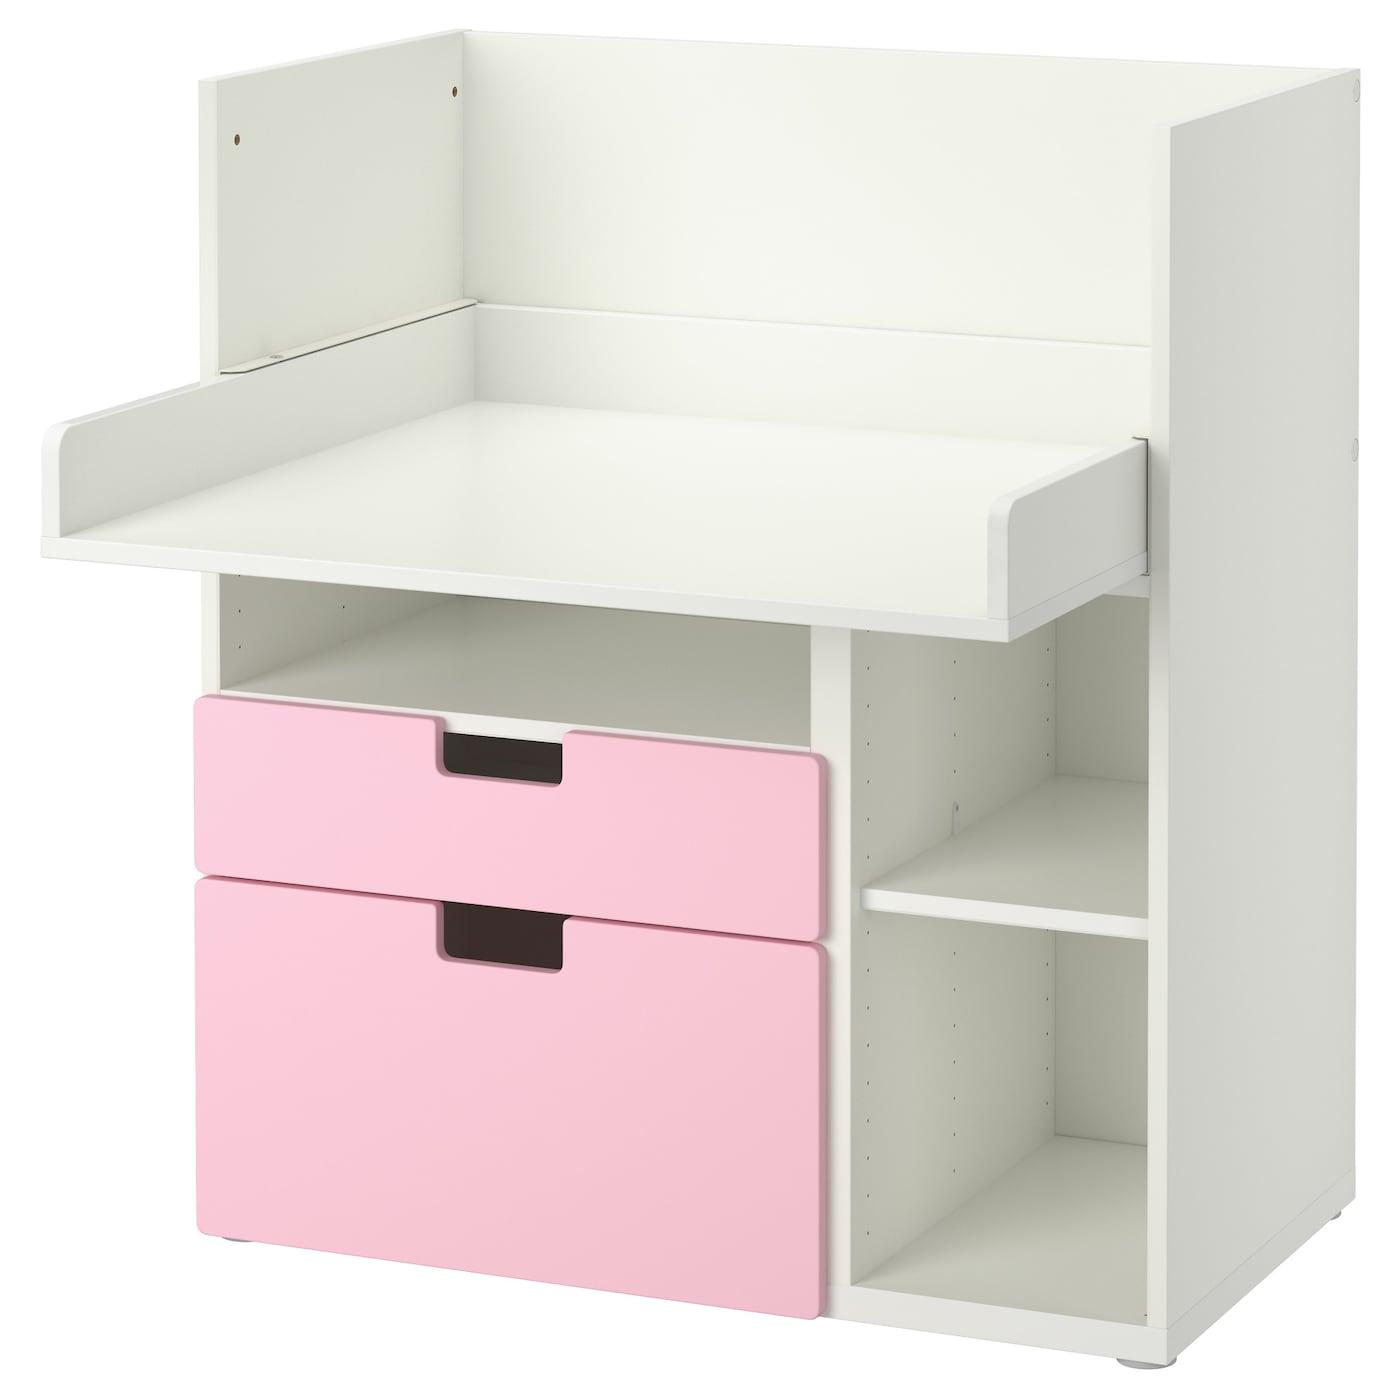 Ikea Malm Bett Lattenrost Passt Nicht ~ Kinderschreibtische online  Möbel Suchmaschine  moebelguru com